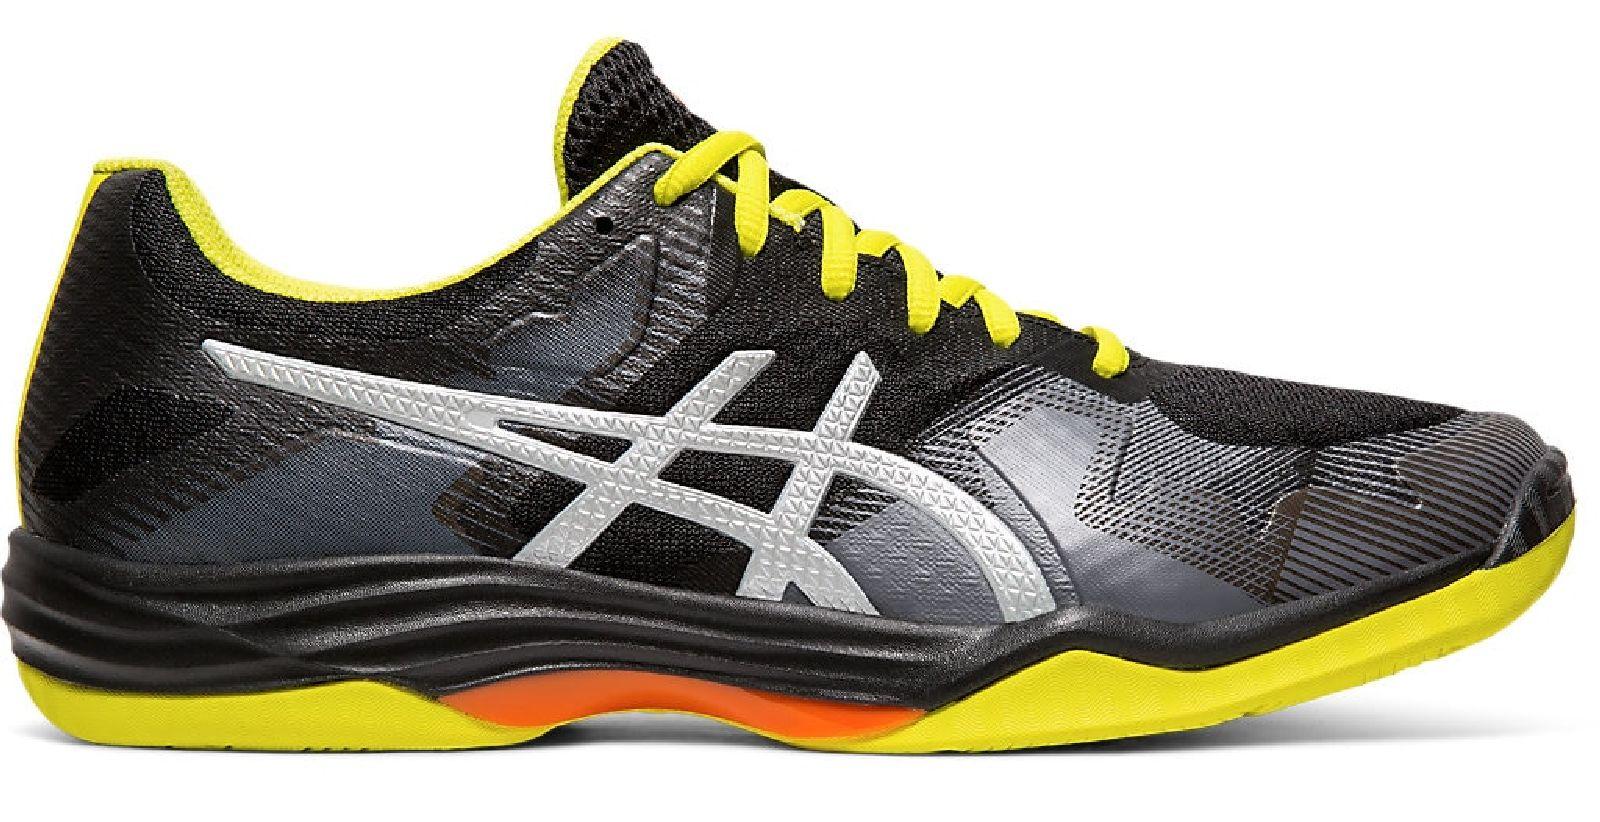 Details about Asics Mens Volleyball Handball Shoes Halls Shoes Gel Tactic 2 M Black show original title